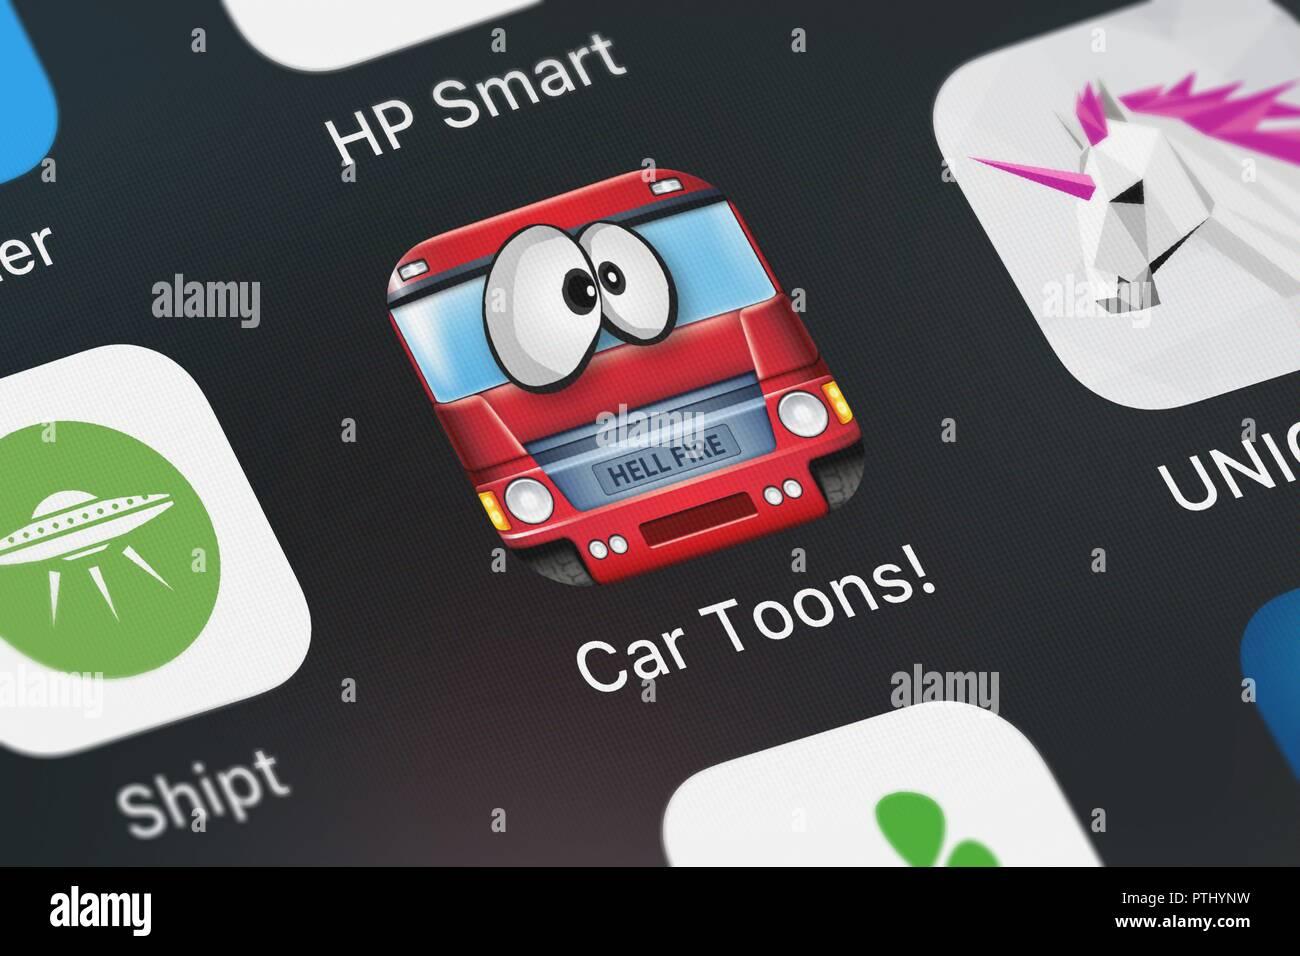 London, Großbritannien - 09 Oktober, 2018: Screenshot der FDG Mobile Games GbR mobile App Auto Toons. Stockbild